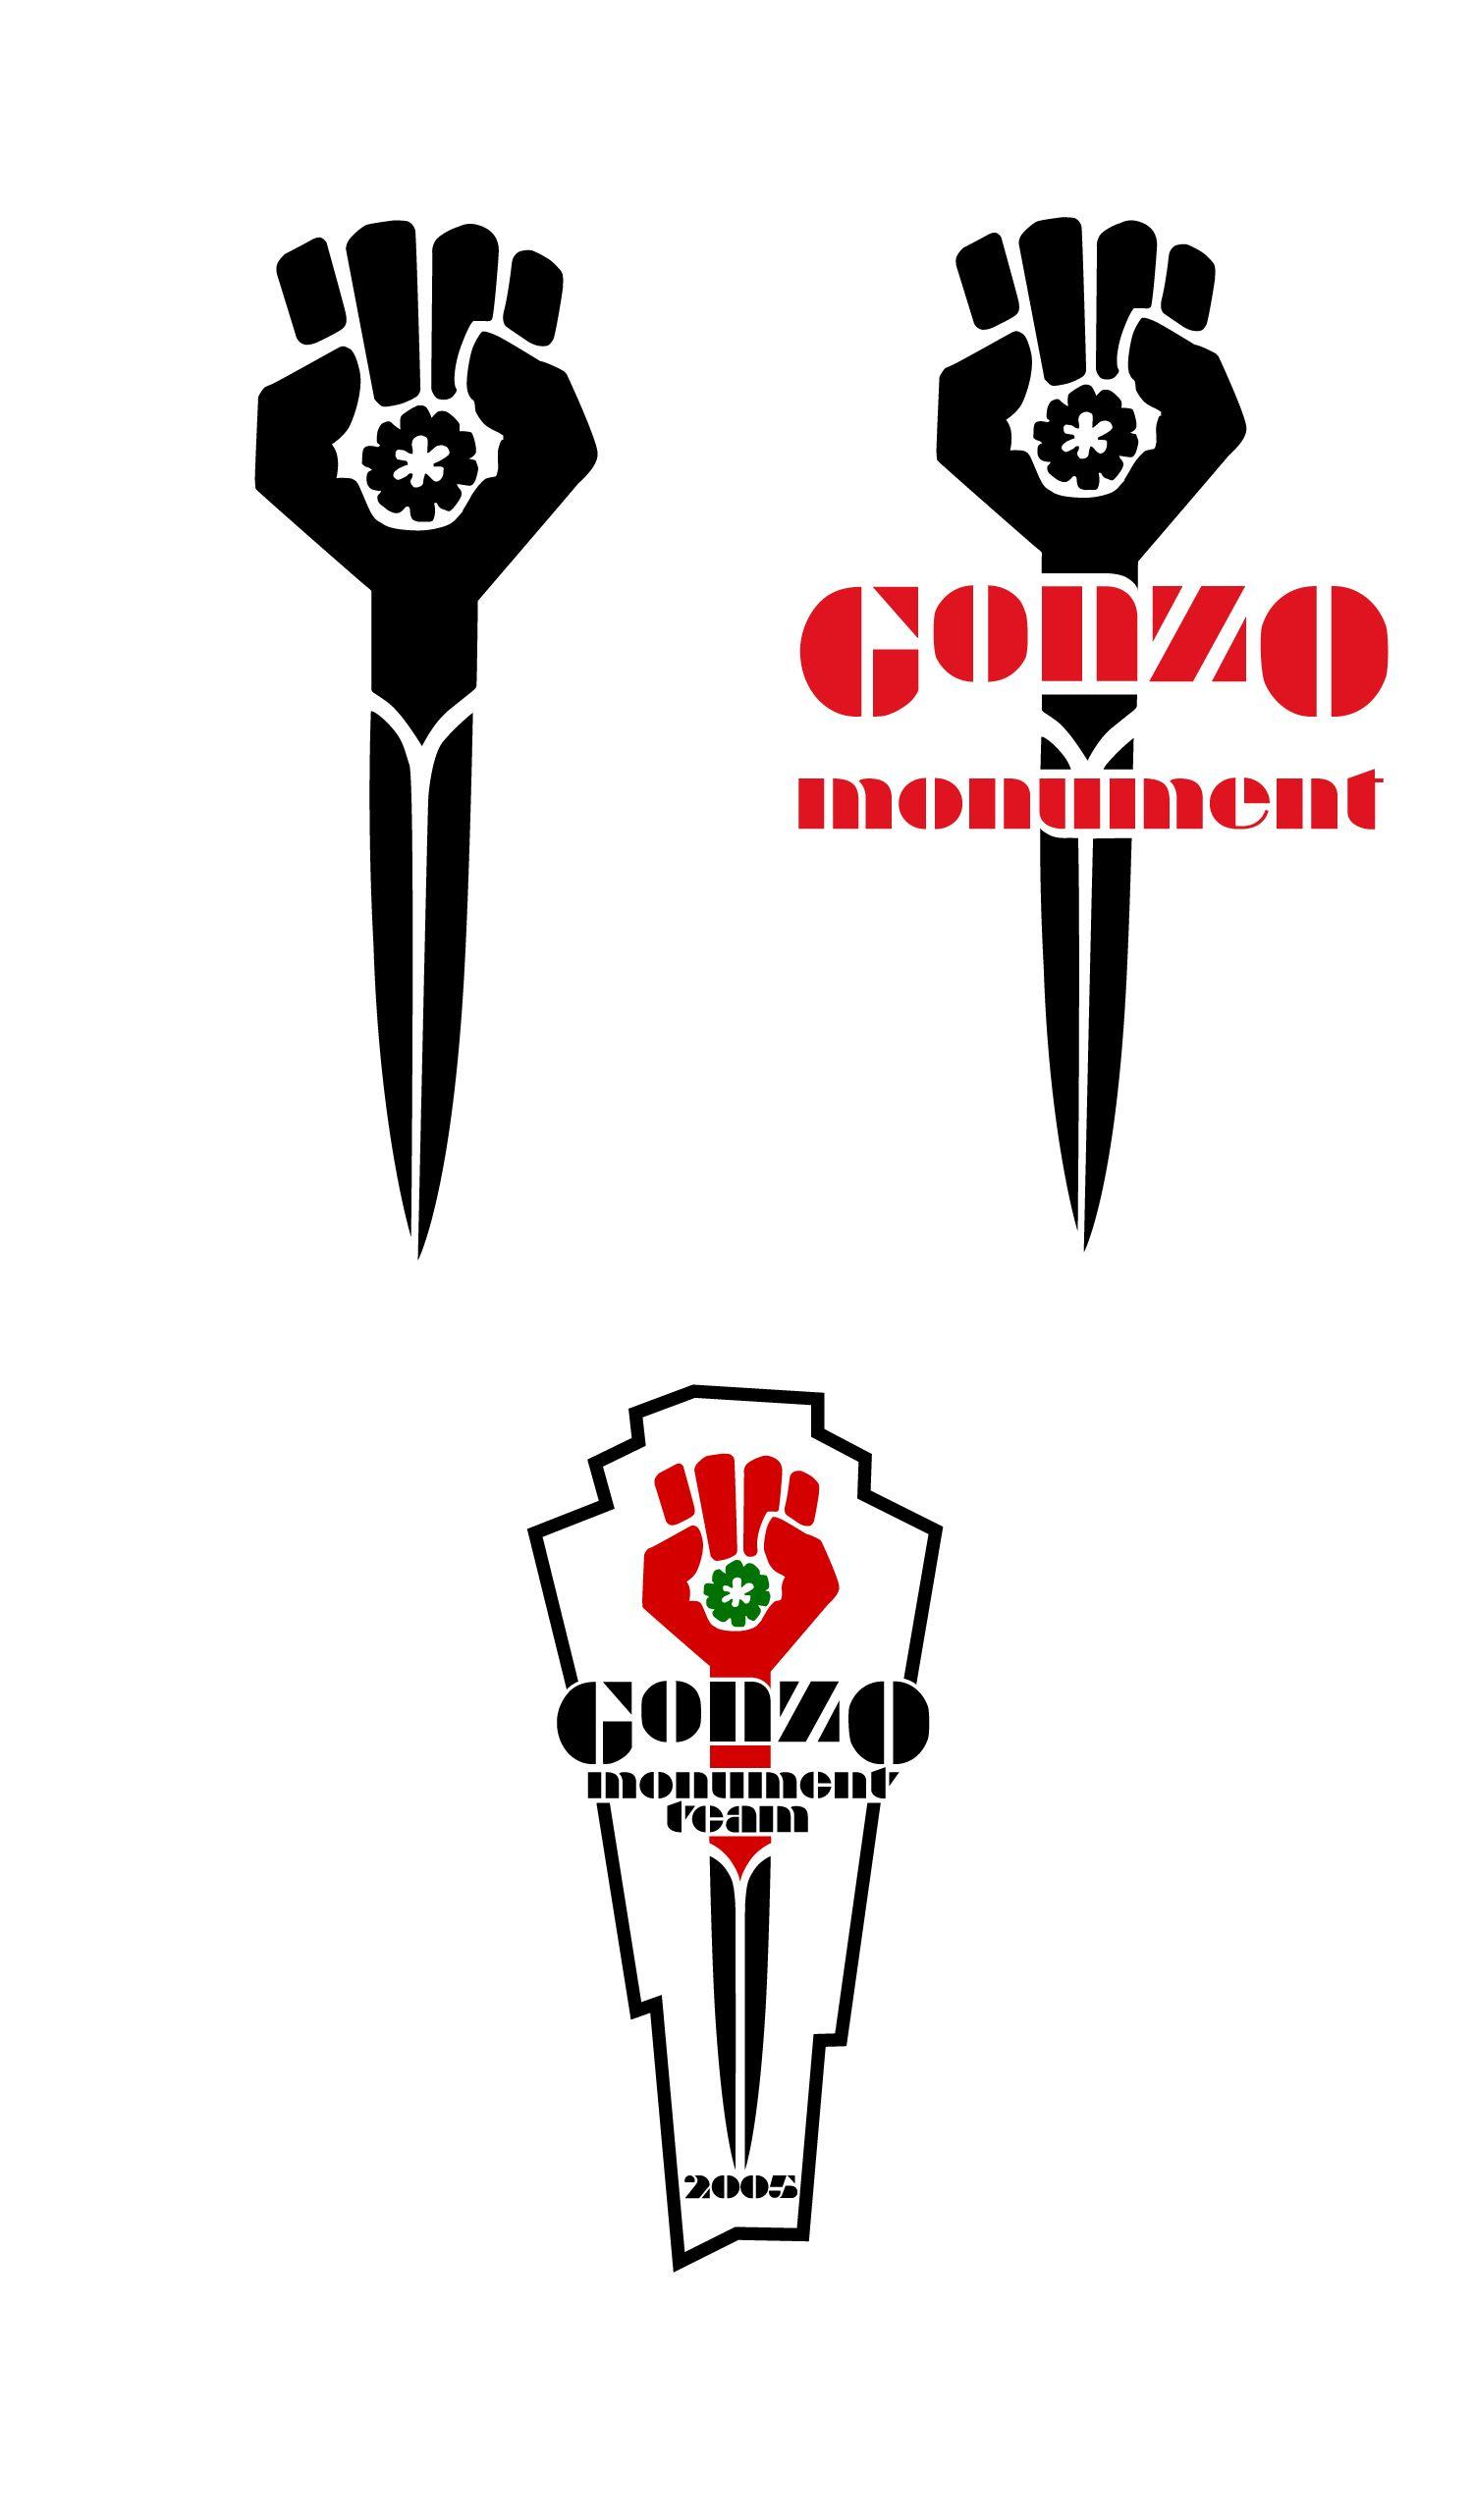 Logo For Gonzo Monument Hunter S Thompson Memorial Circa 2005